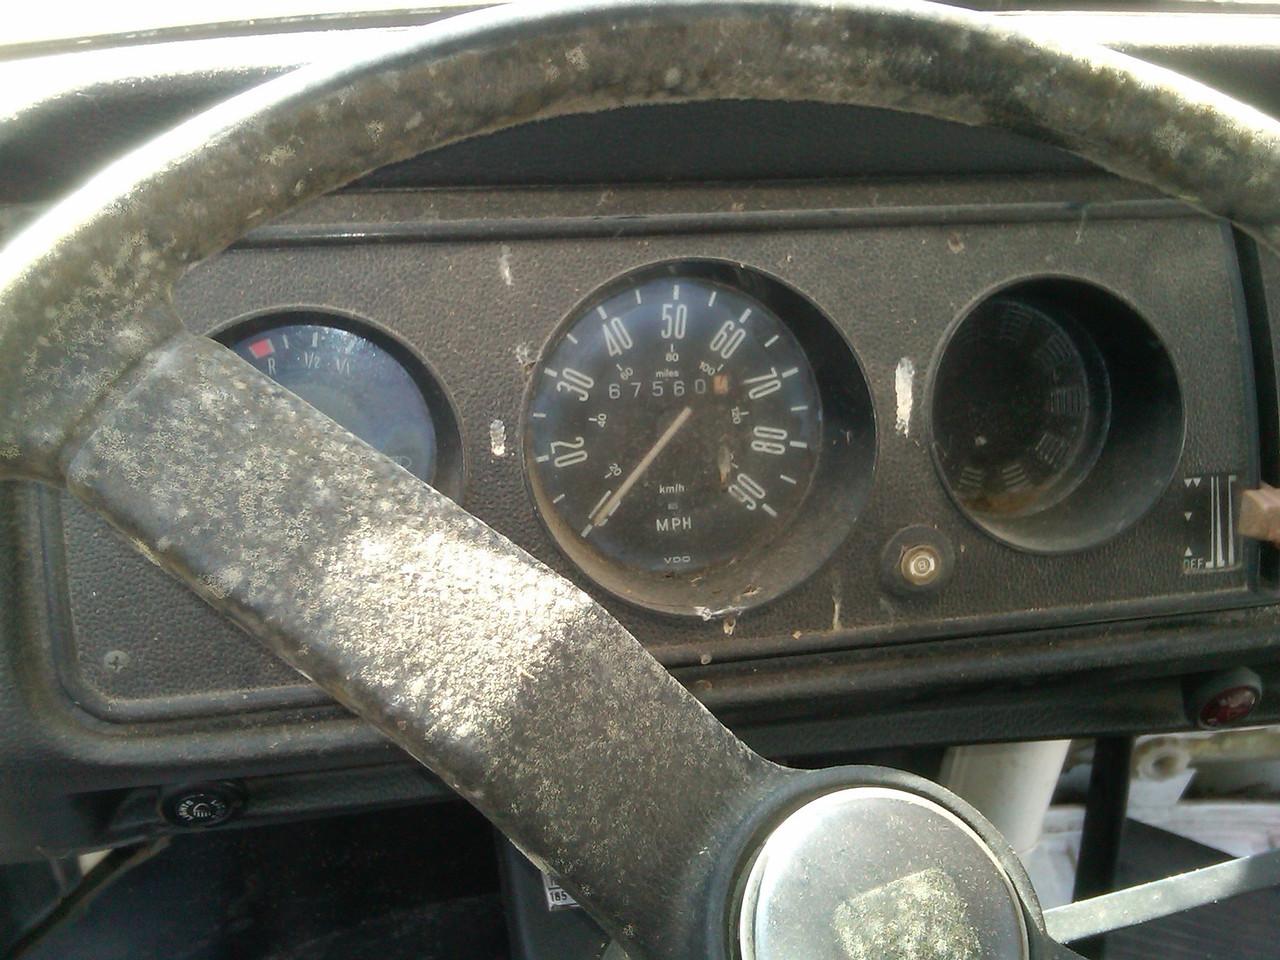 Wheel condition, bird droppings on dash,etc. Is 67k miles original?